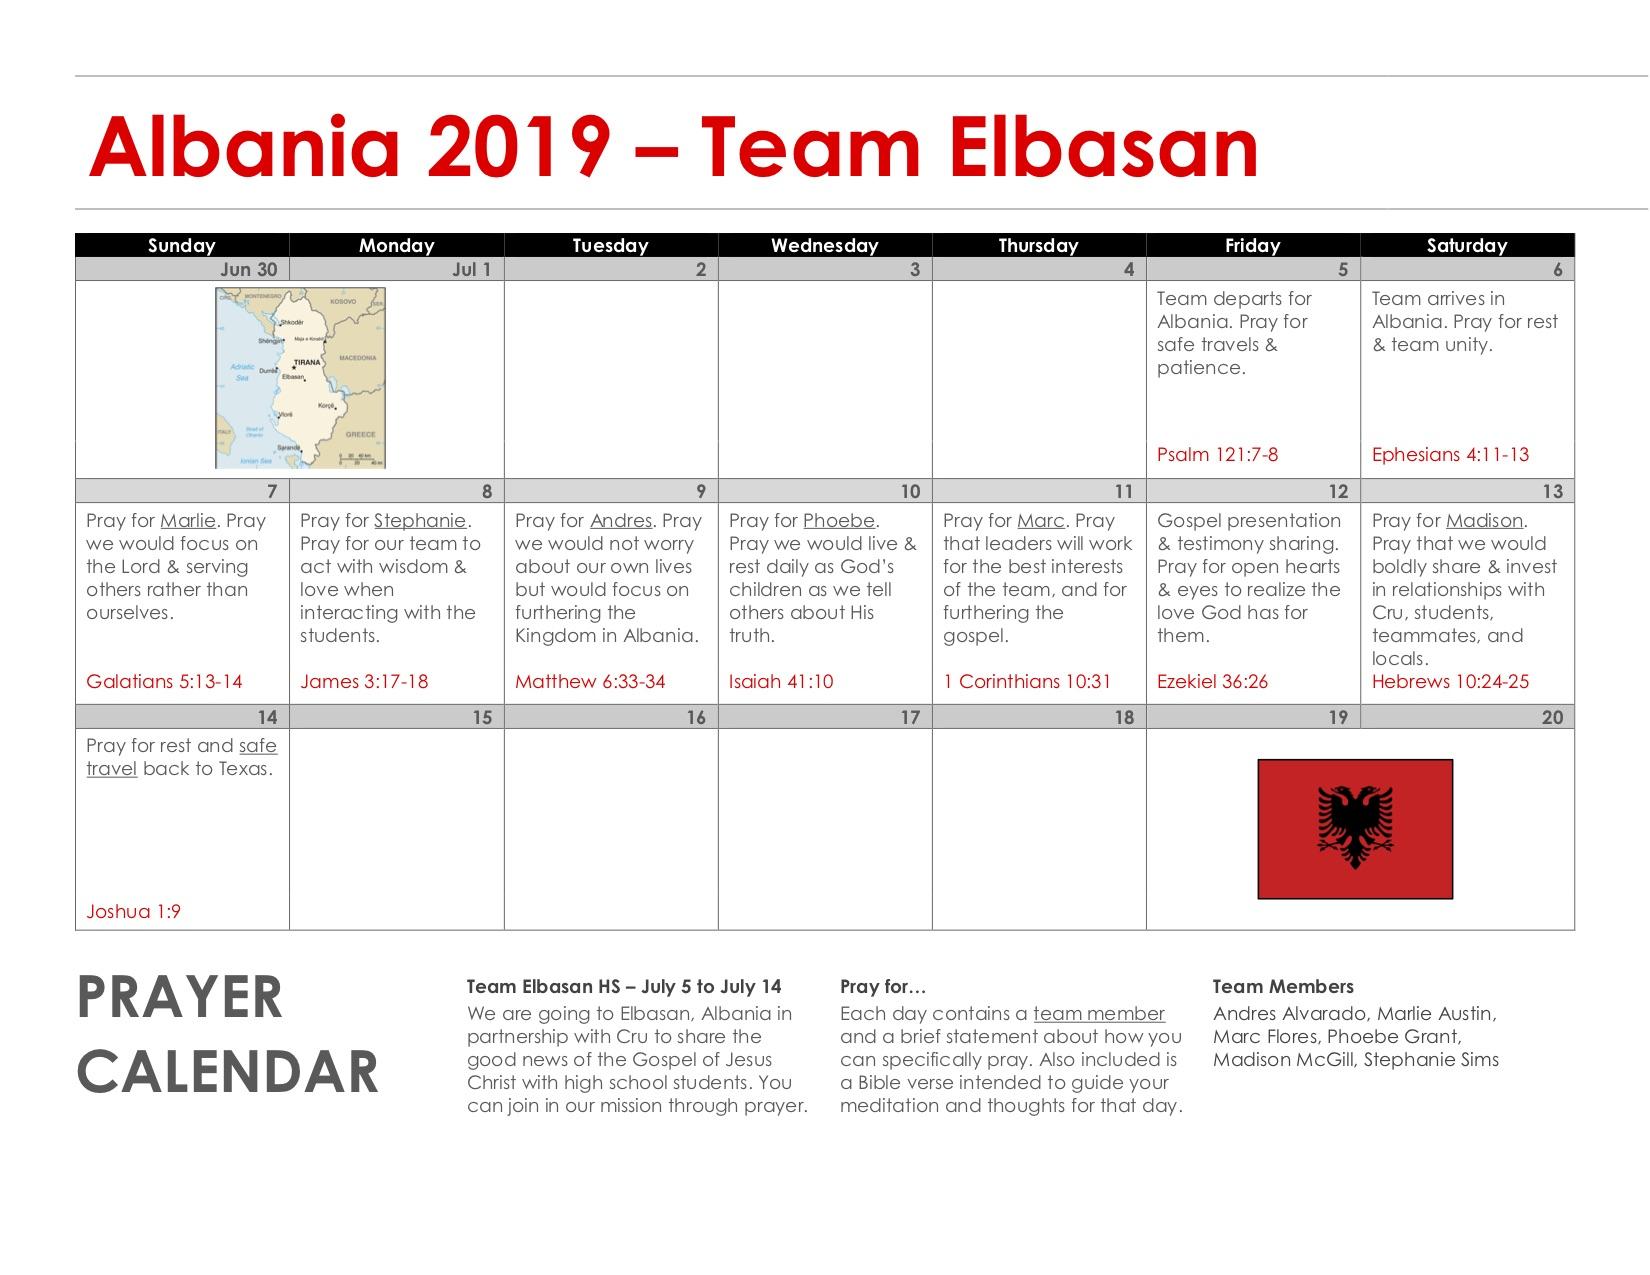 Team Elbasan (High School)